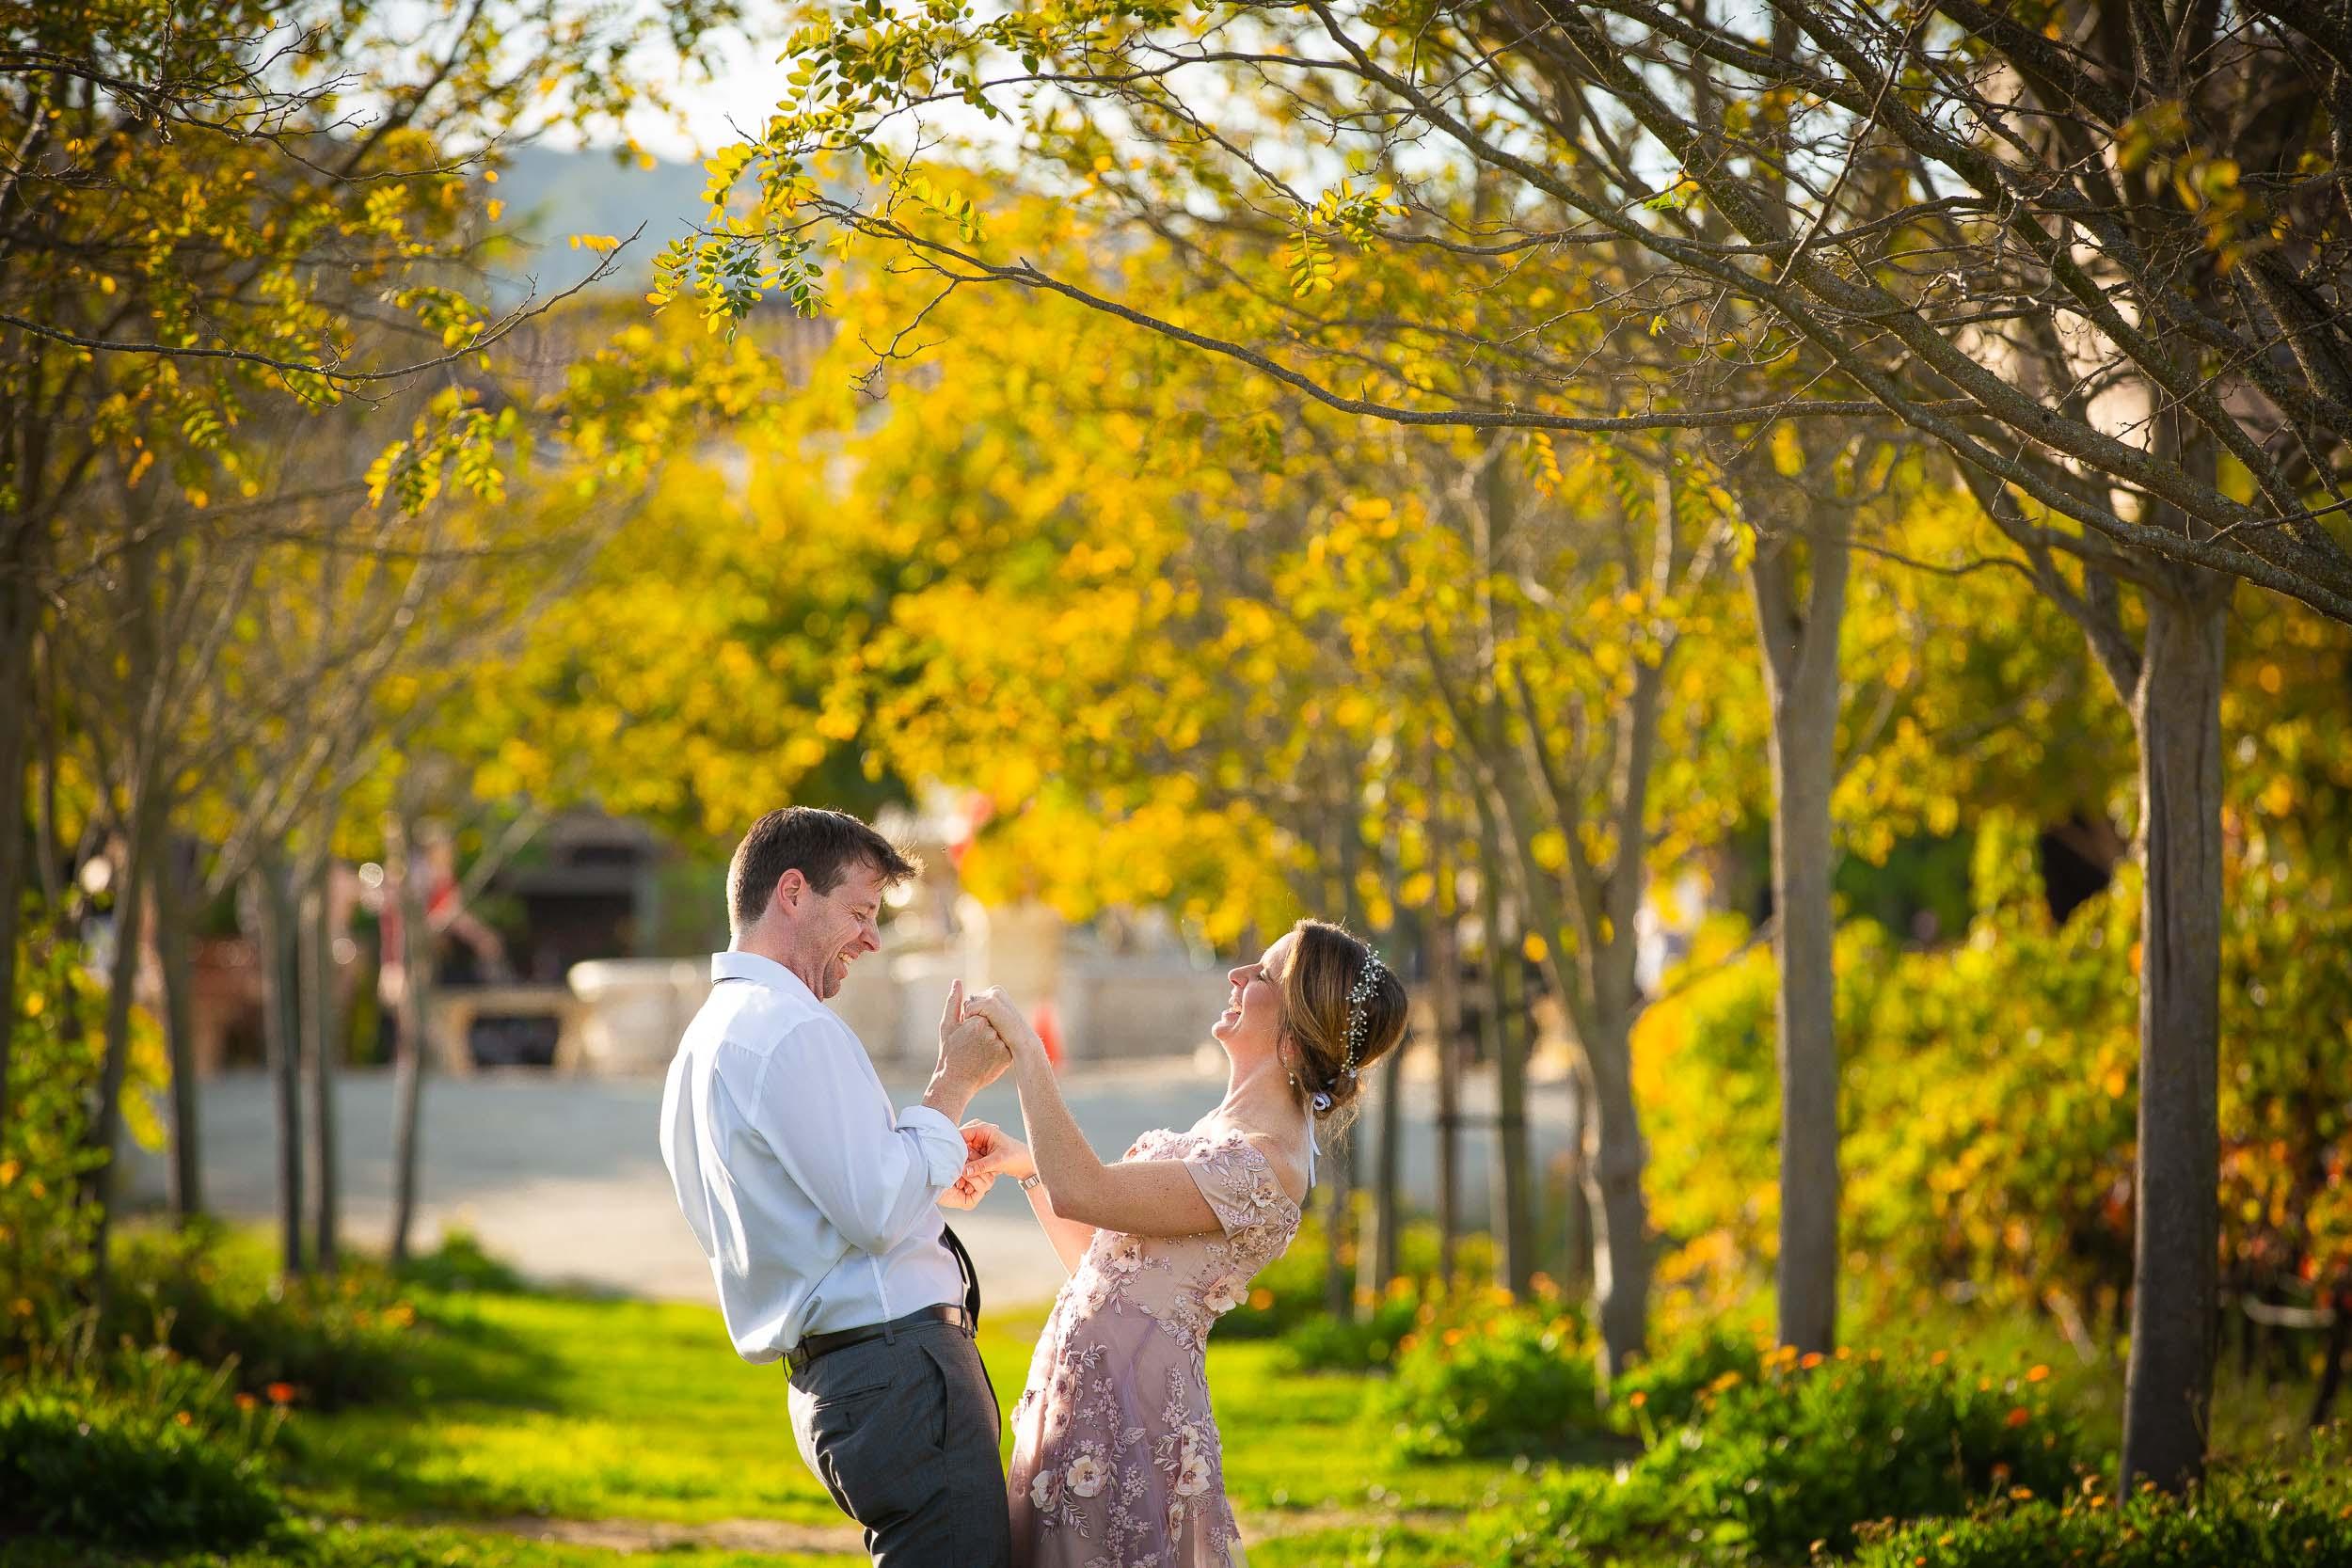 Jacuzzi Family Vineyards Wedding Photos-25.jpg